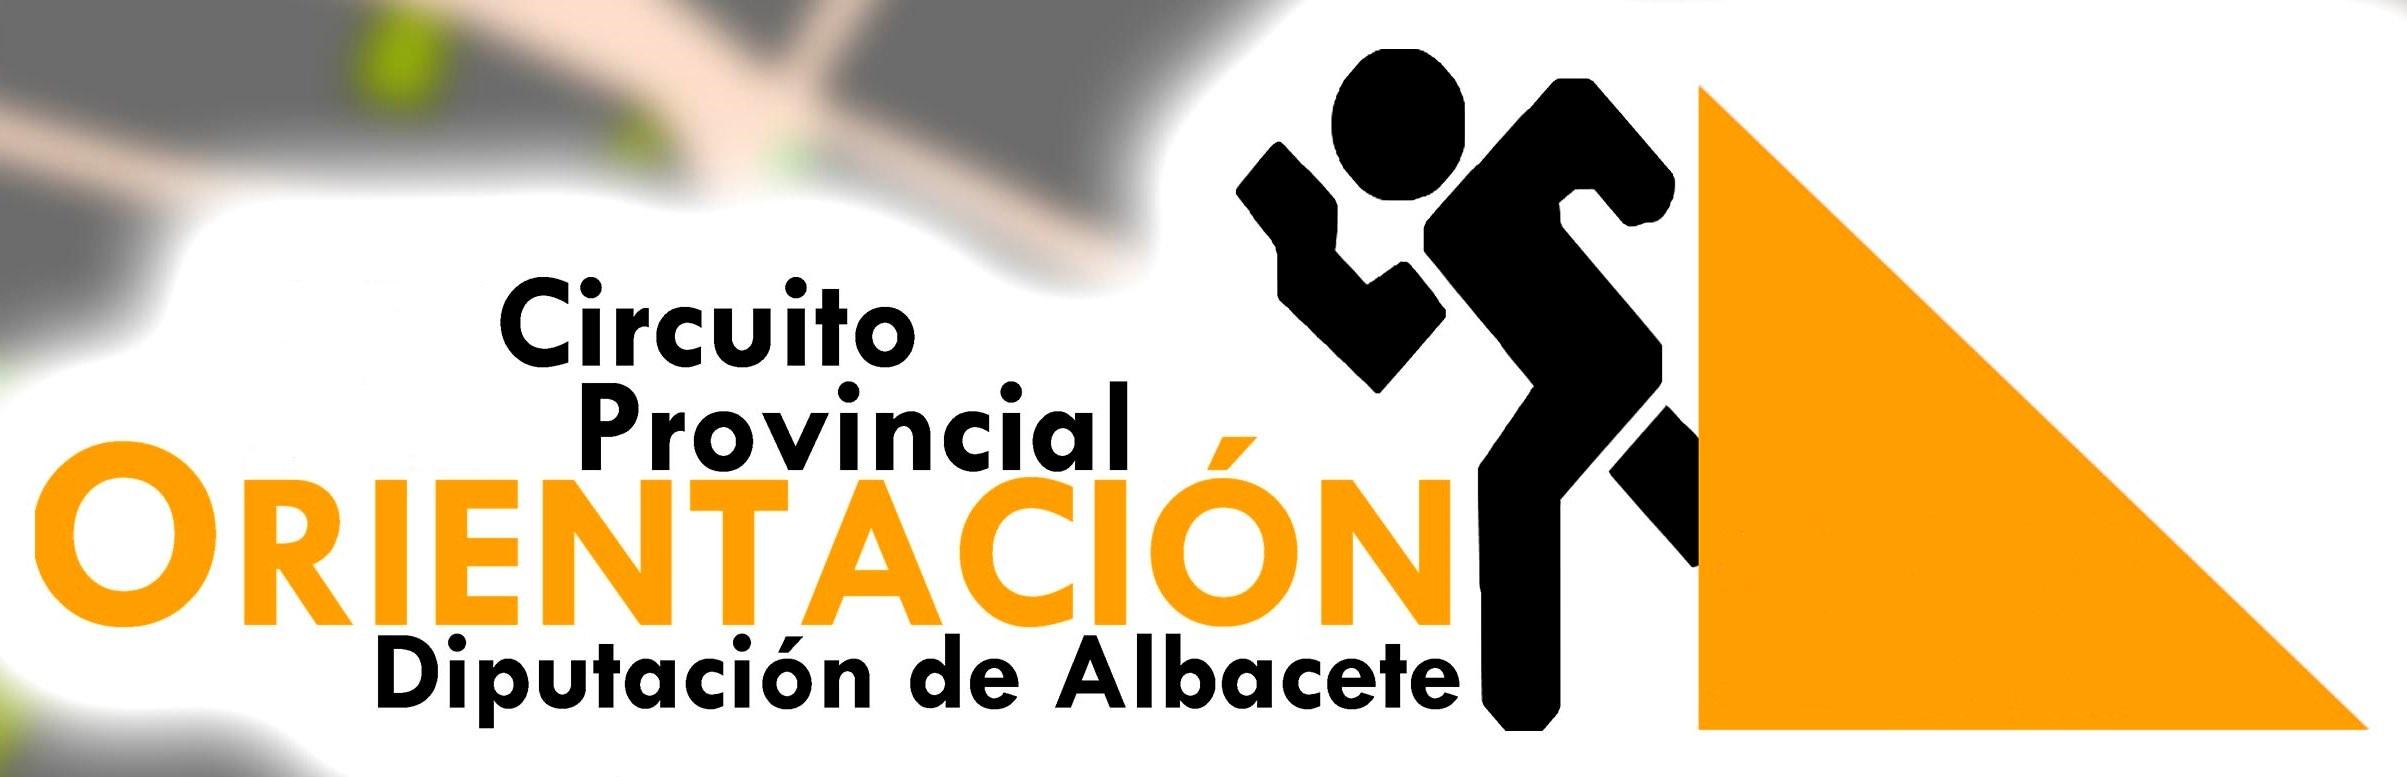 Circuito Provincial de Albacete